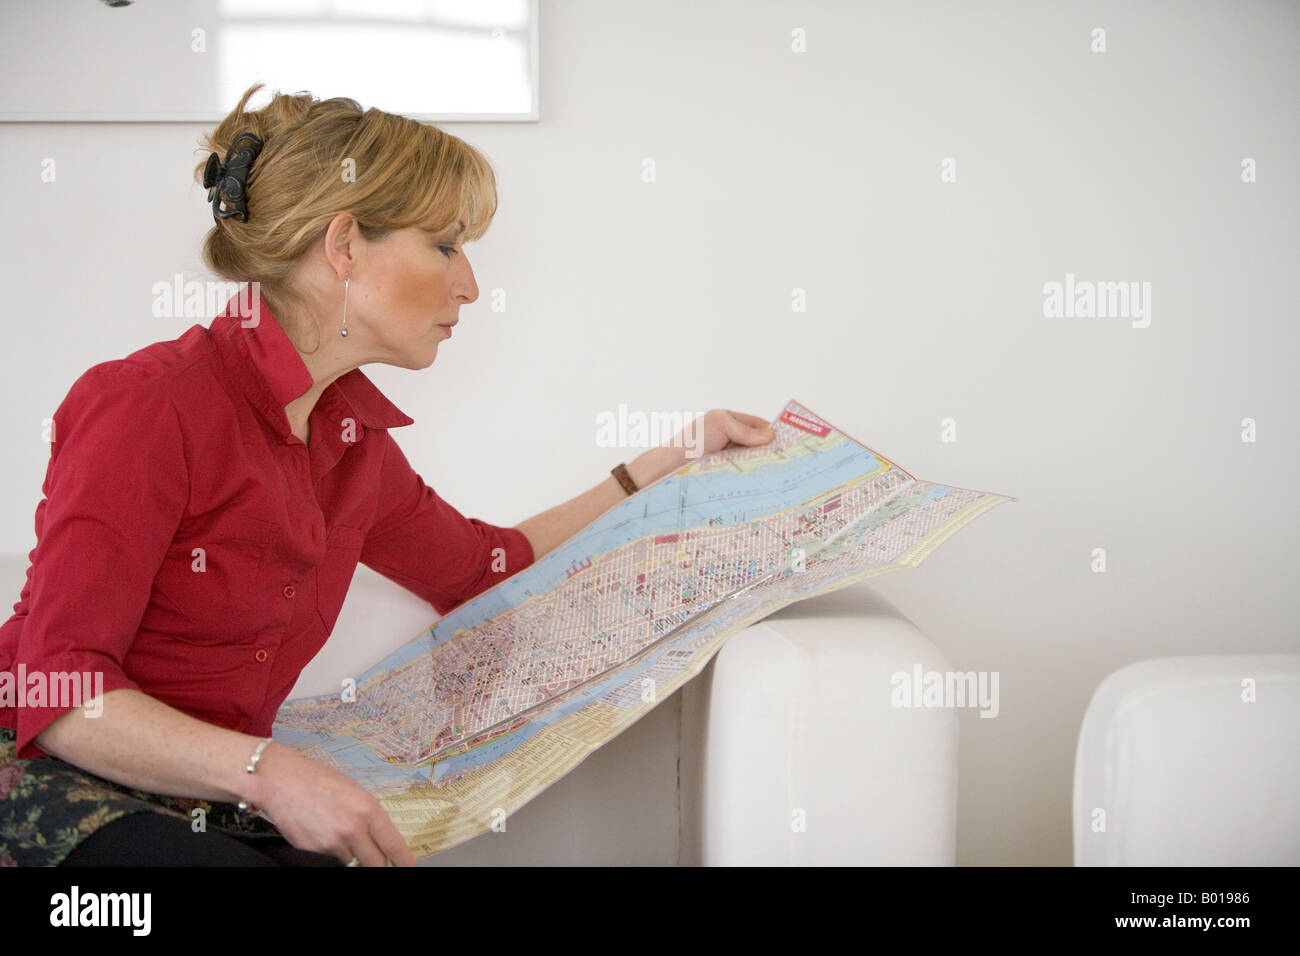 Senior woman reading a map Photo Stock